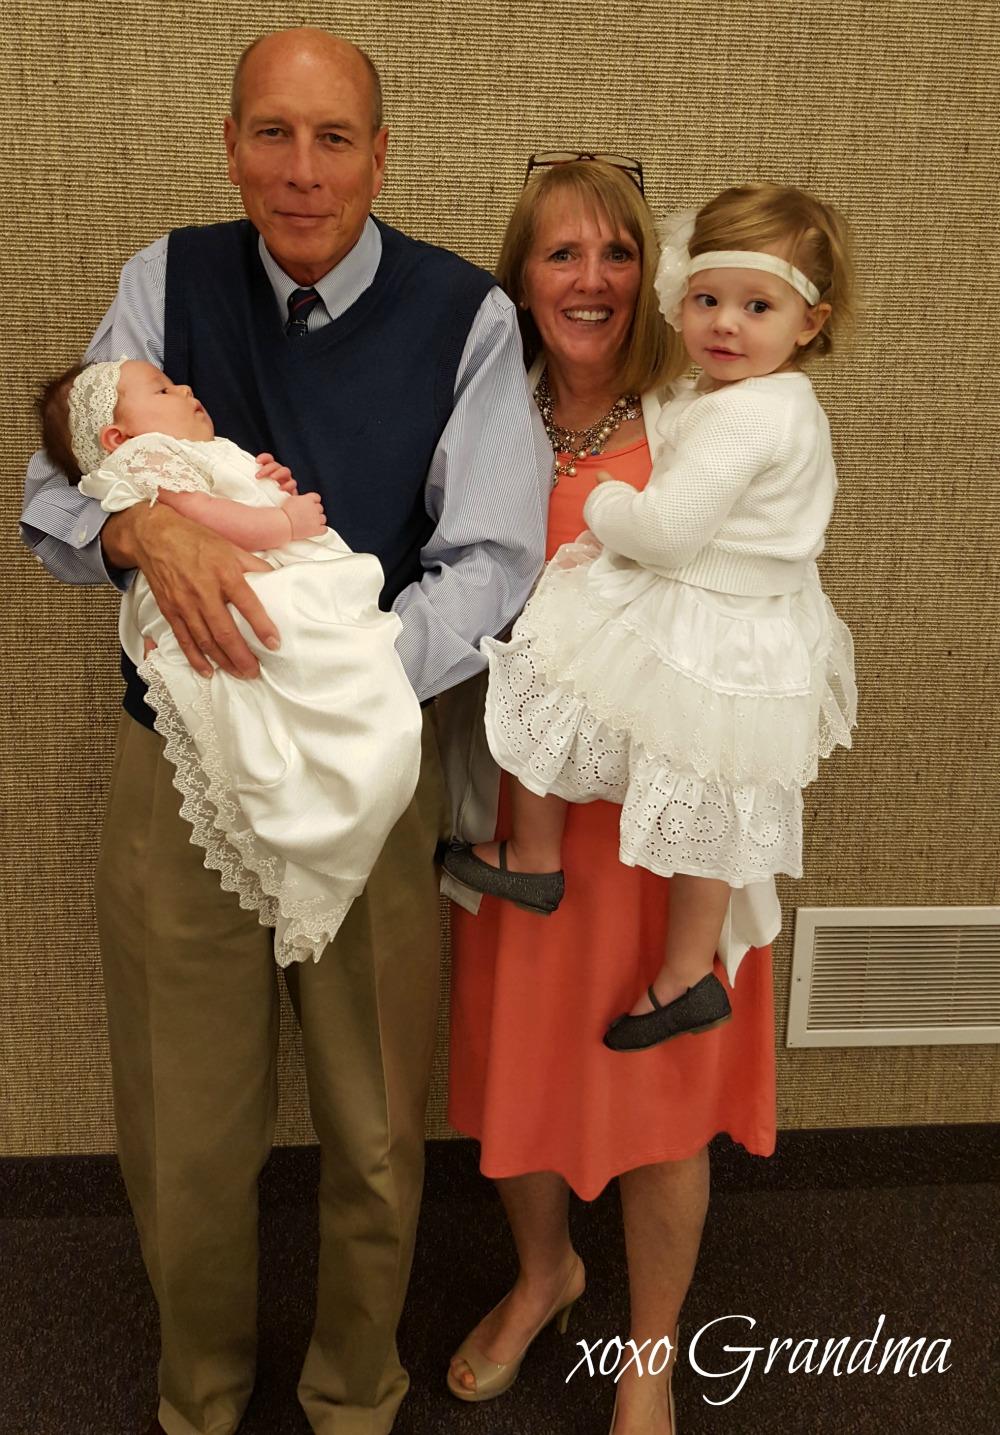 Xoxo Grandma Baby Blessing Dress Using Mommy S Wedding Dress